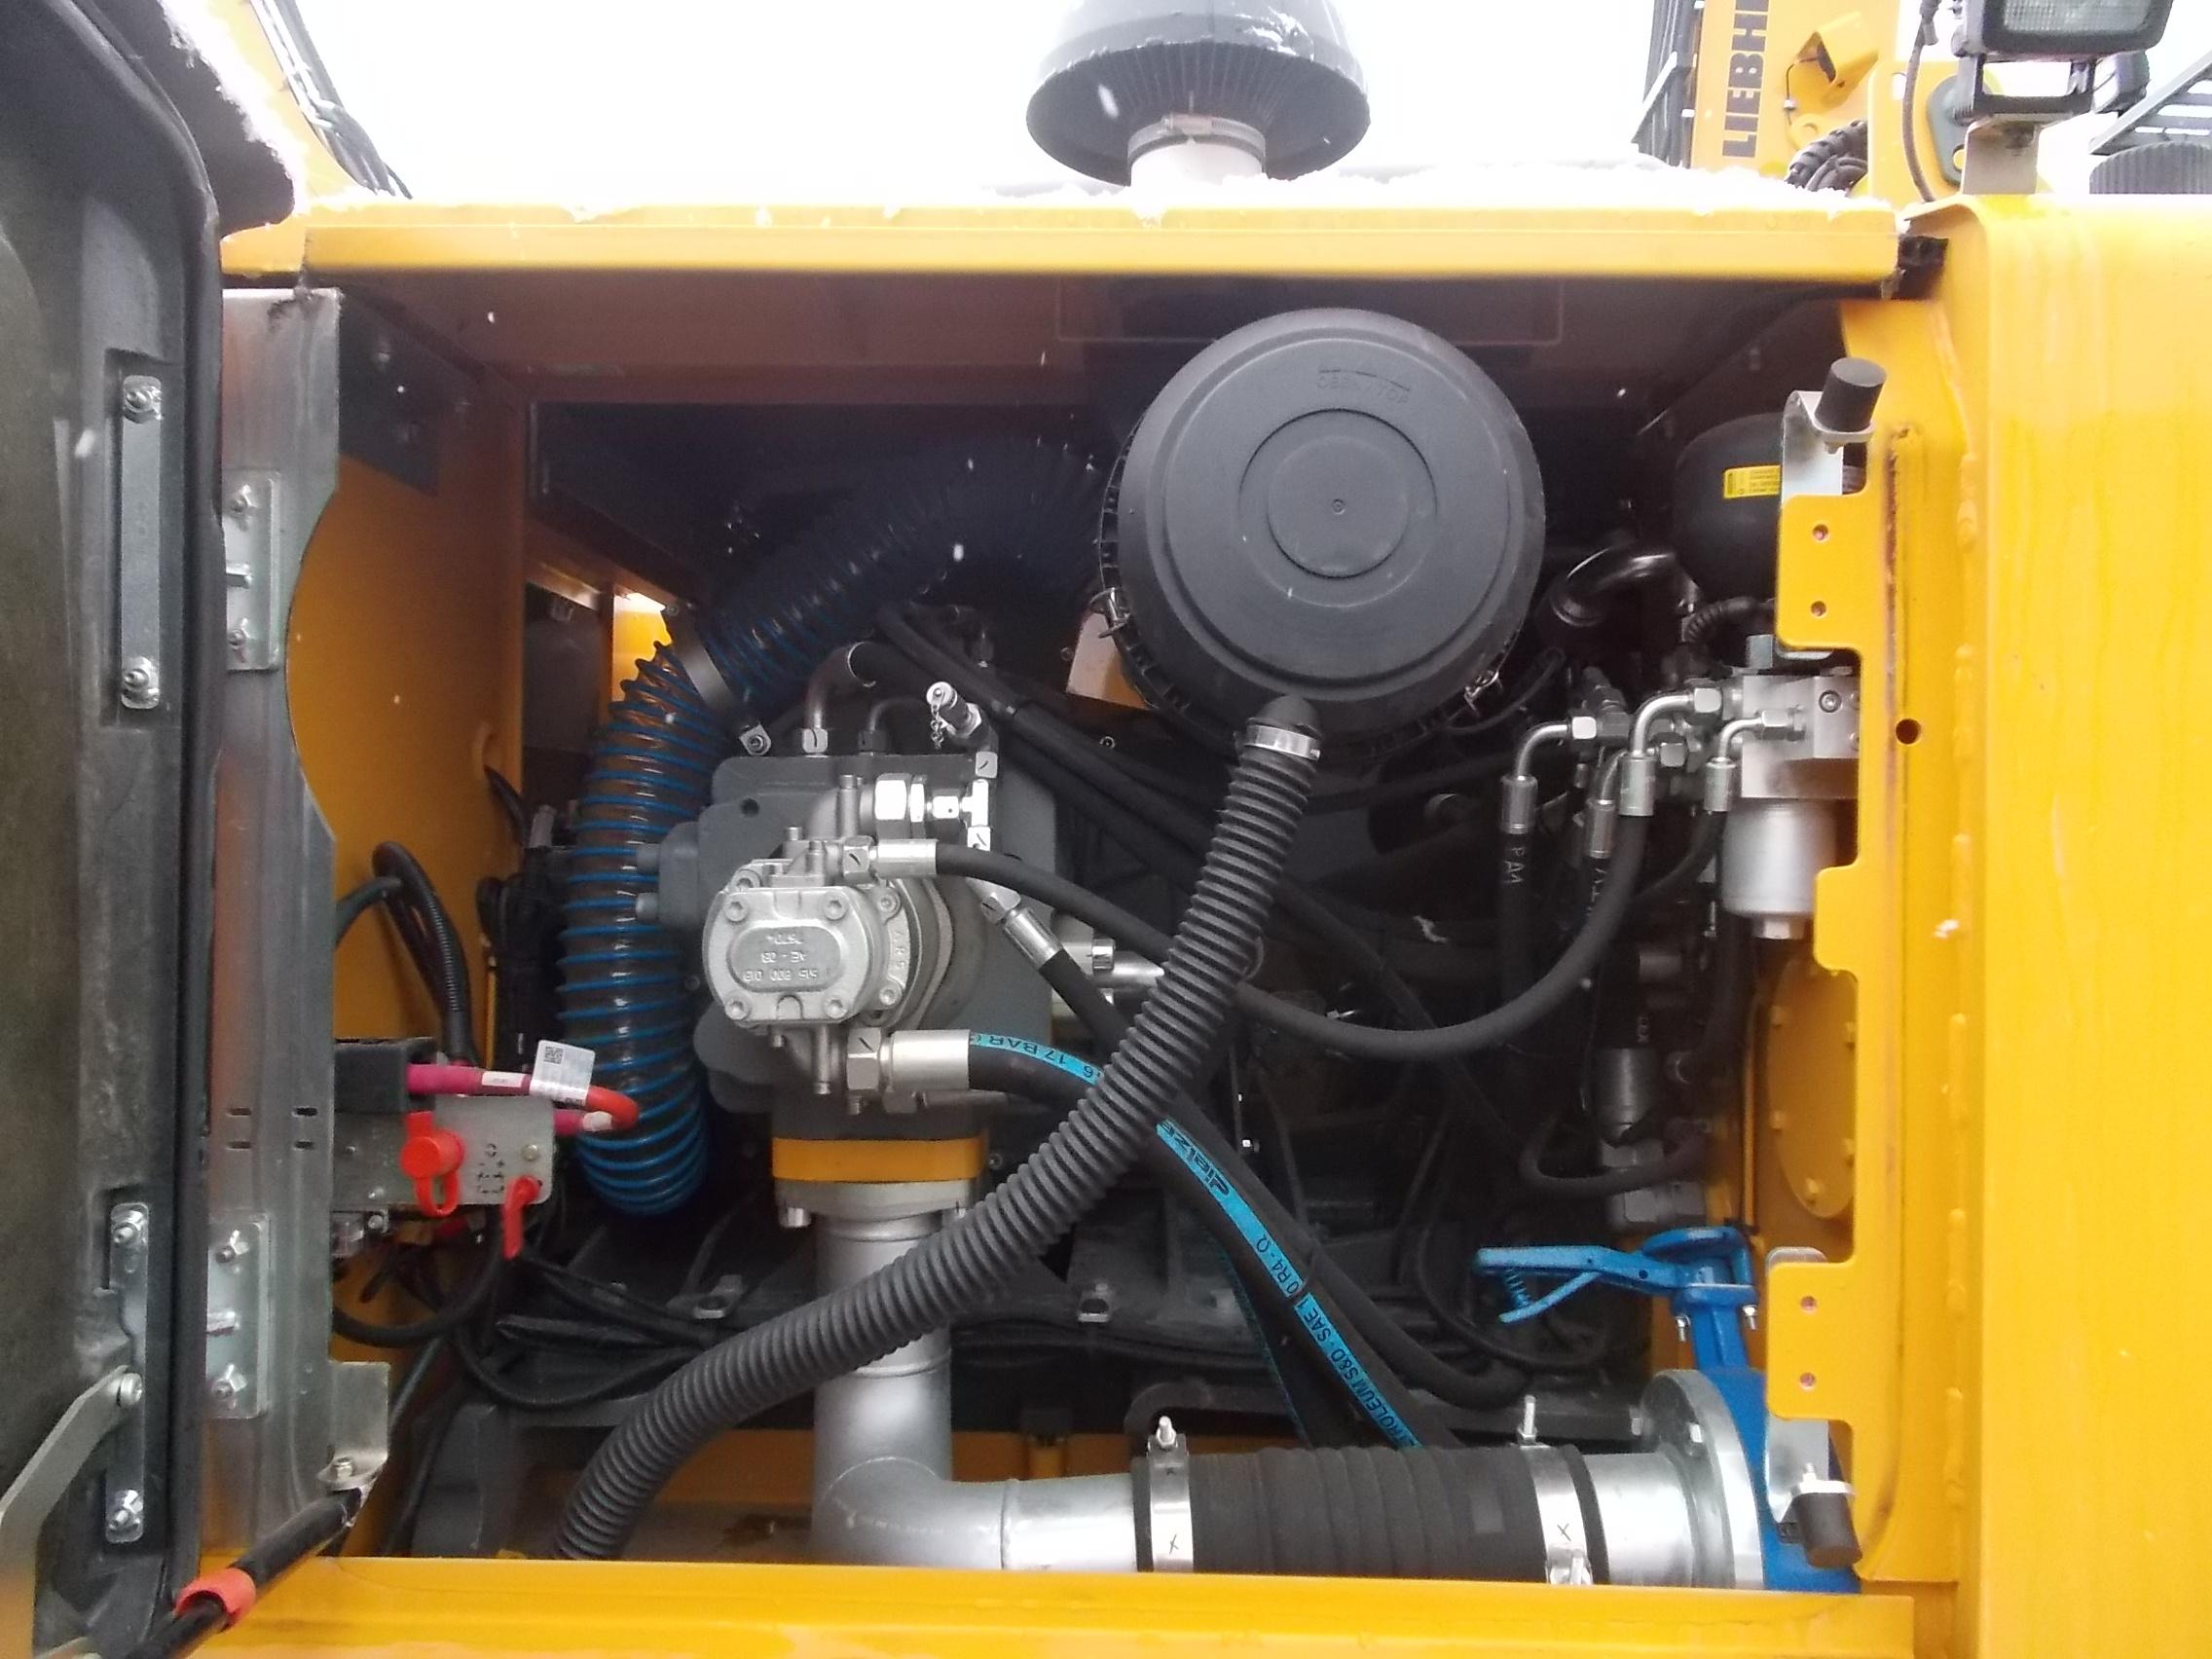 LH 26C Electric-1704-83202_007.JPG